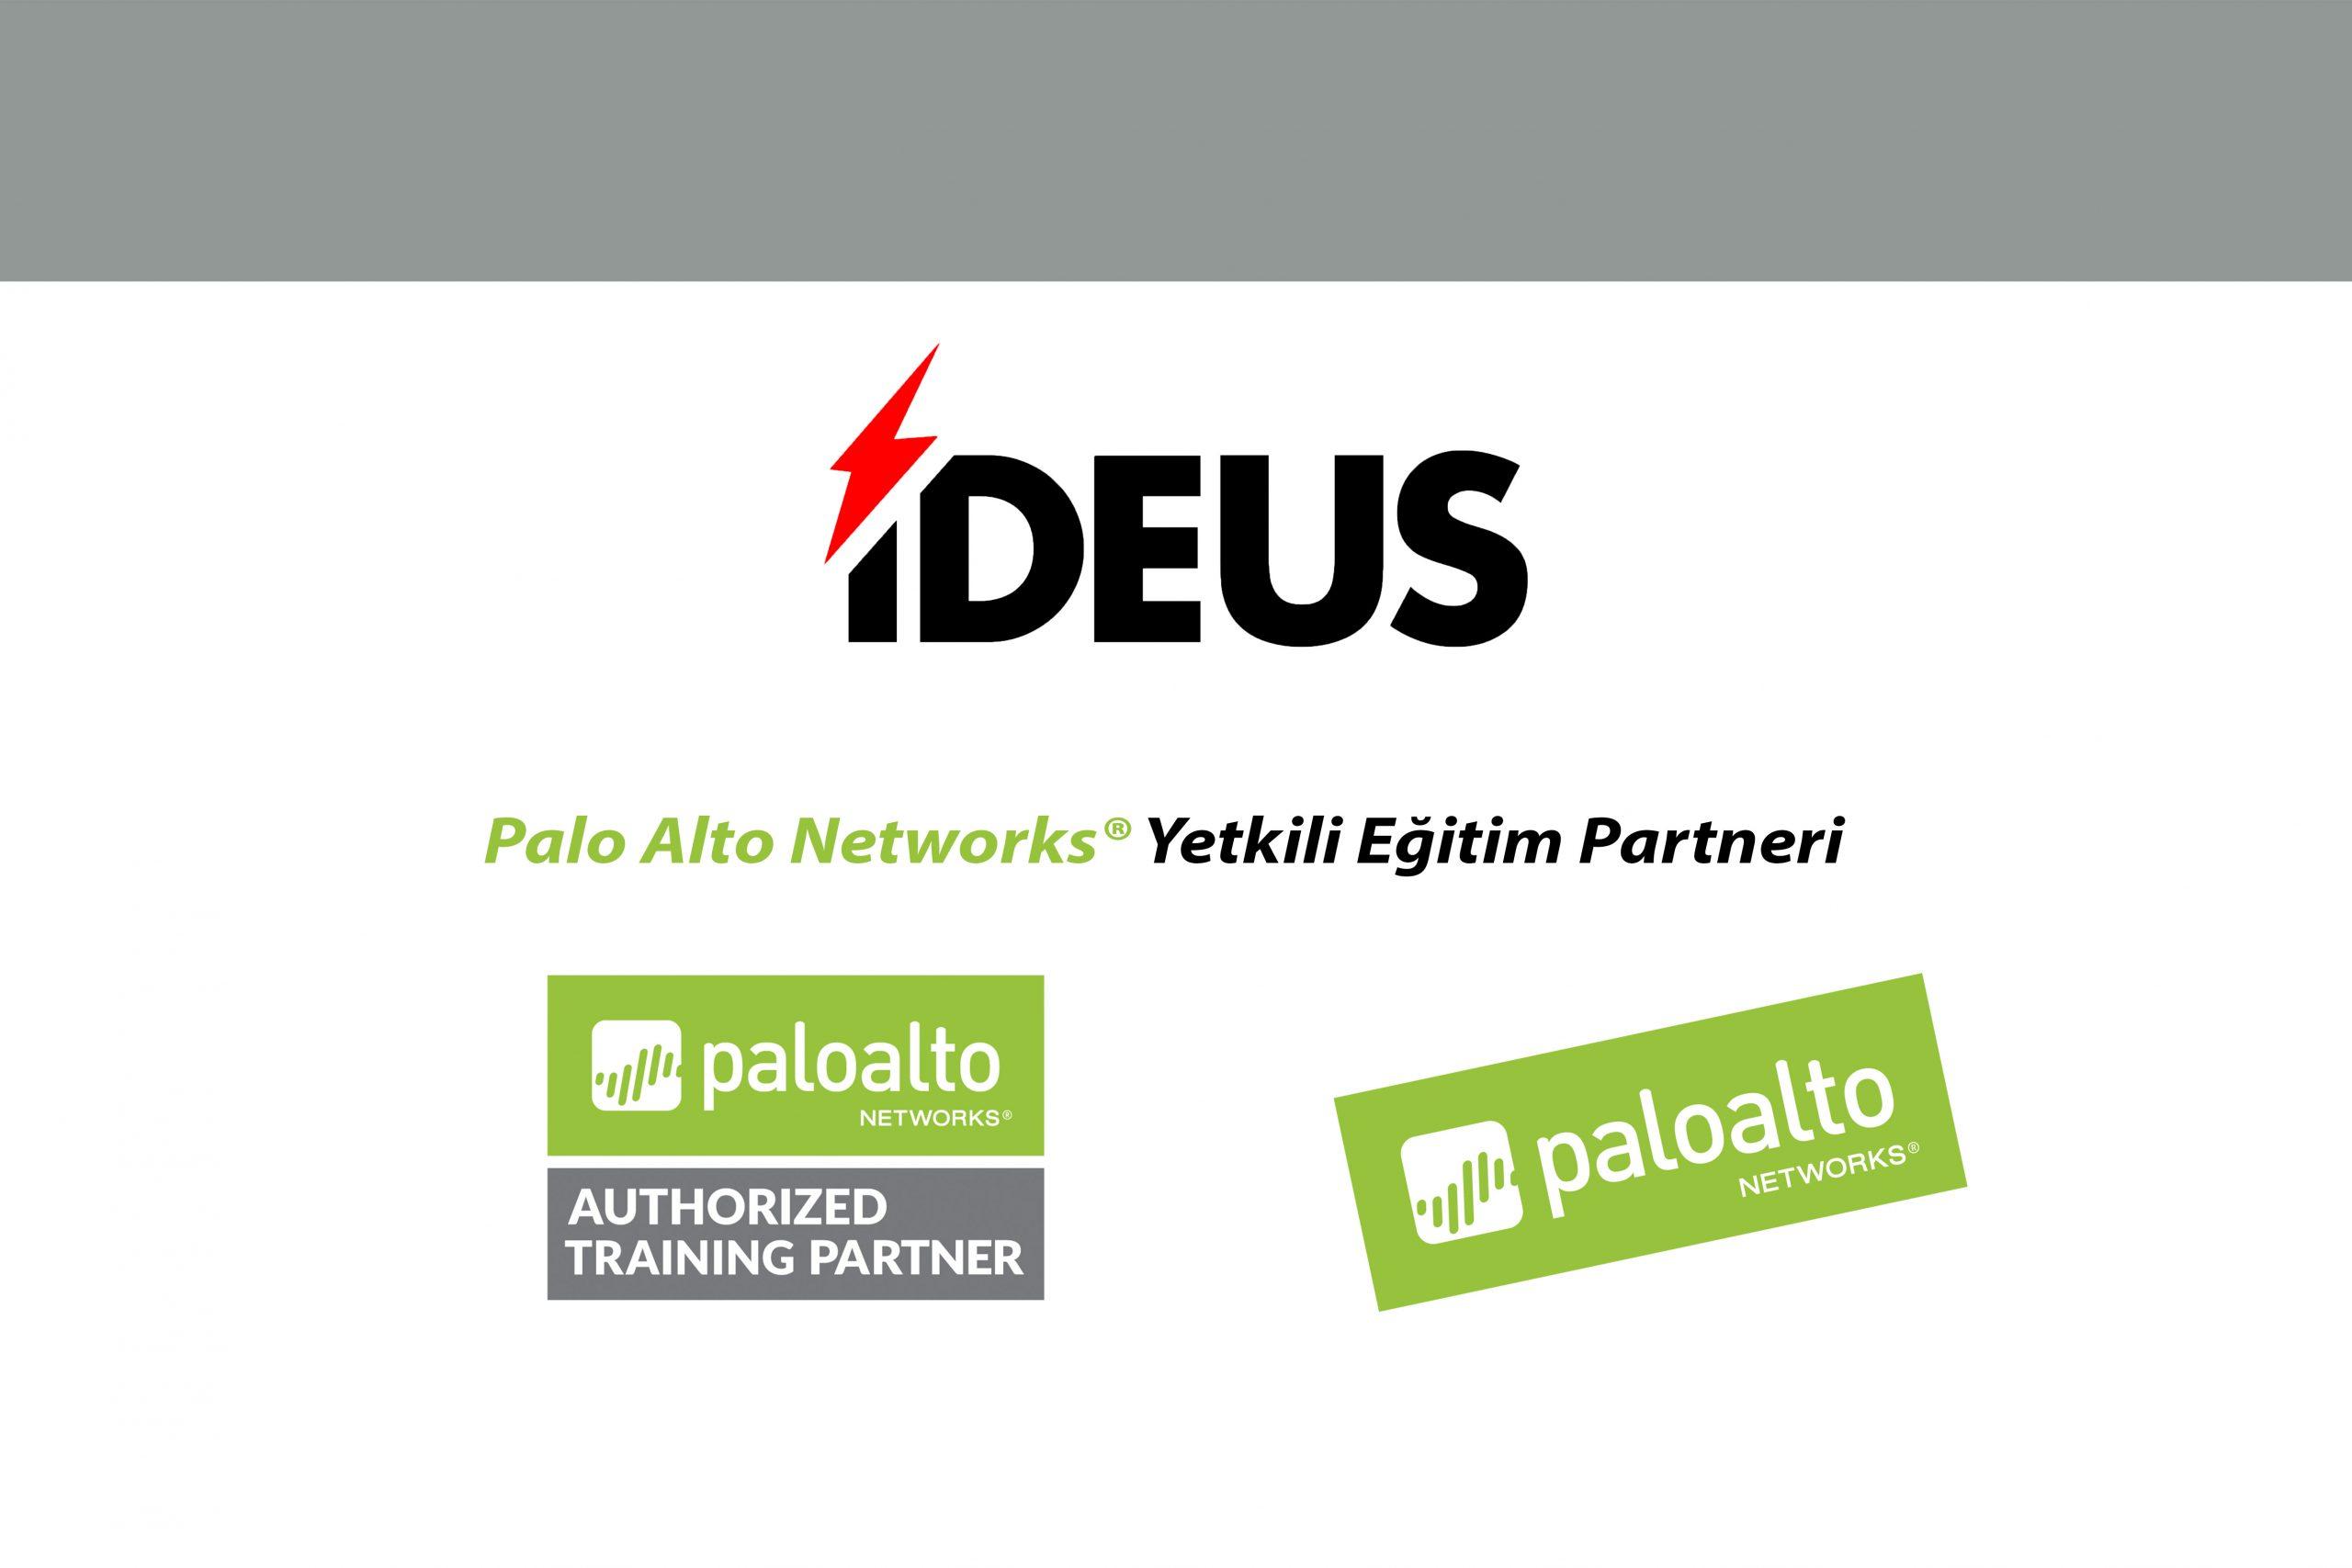 Palo Alto Networks Yetkili Eğitim Merkezi